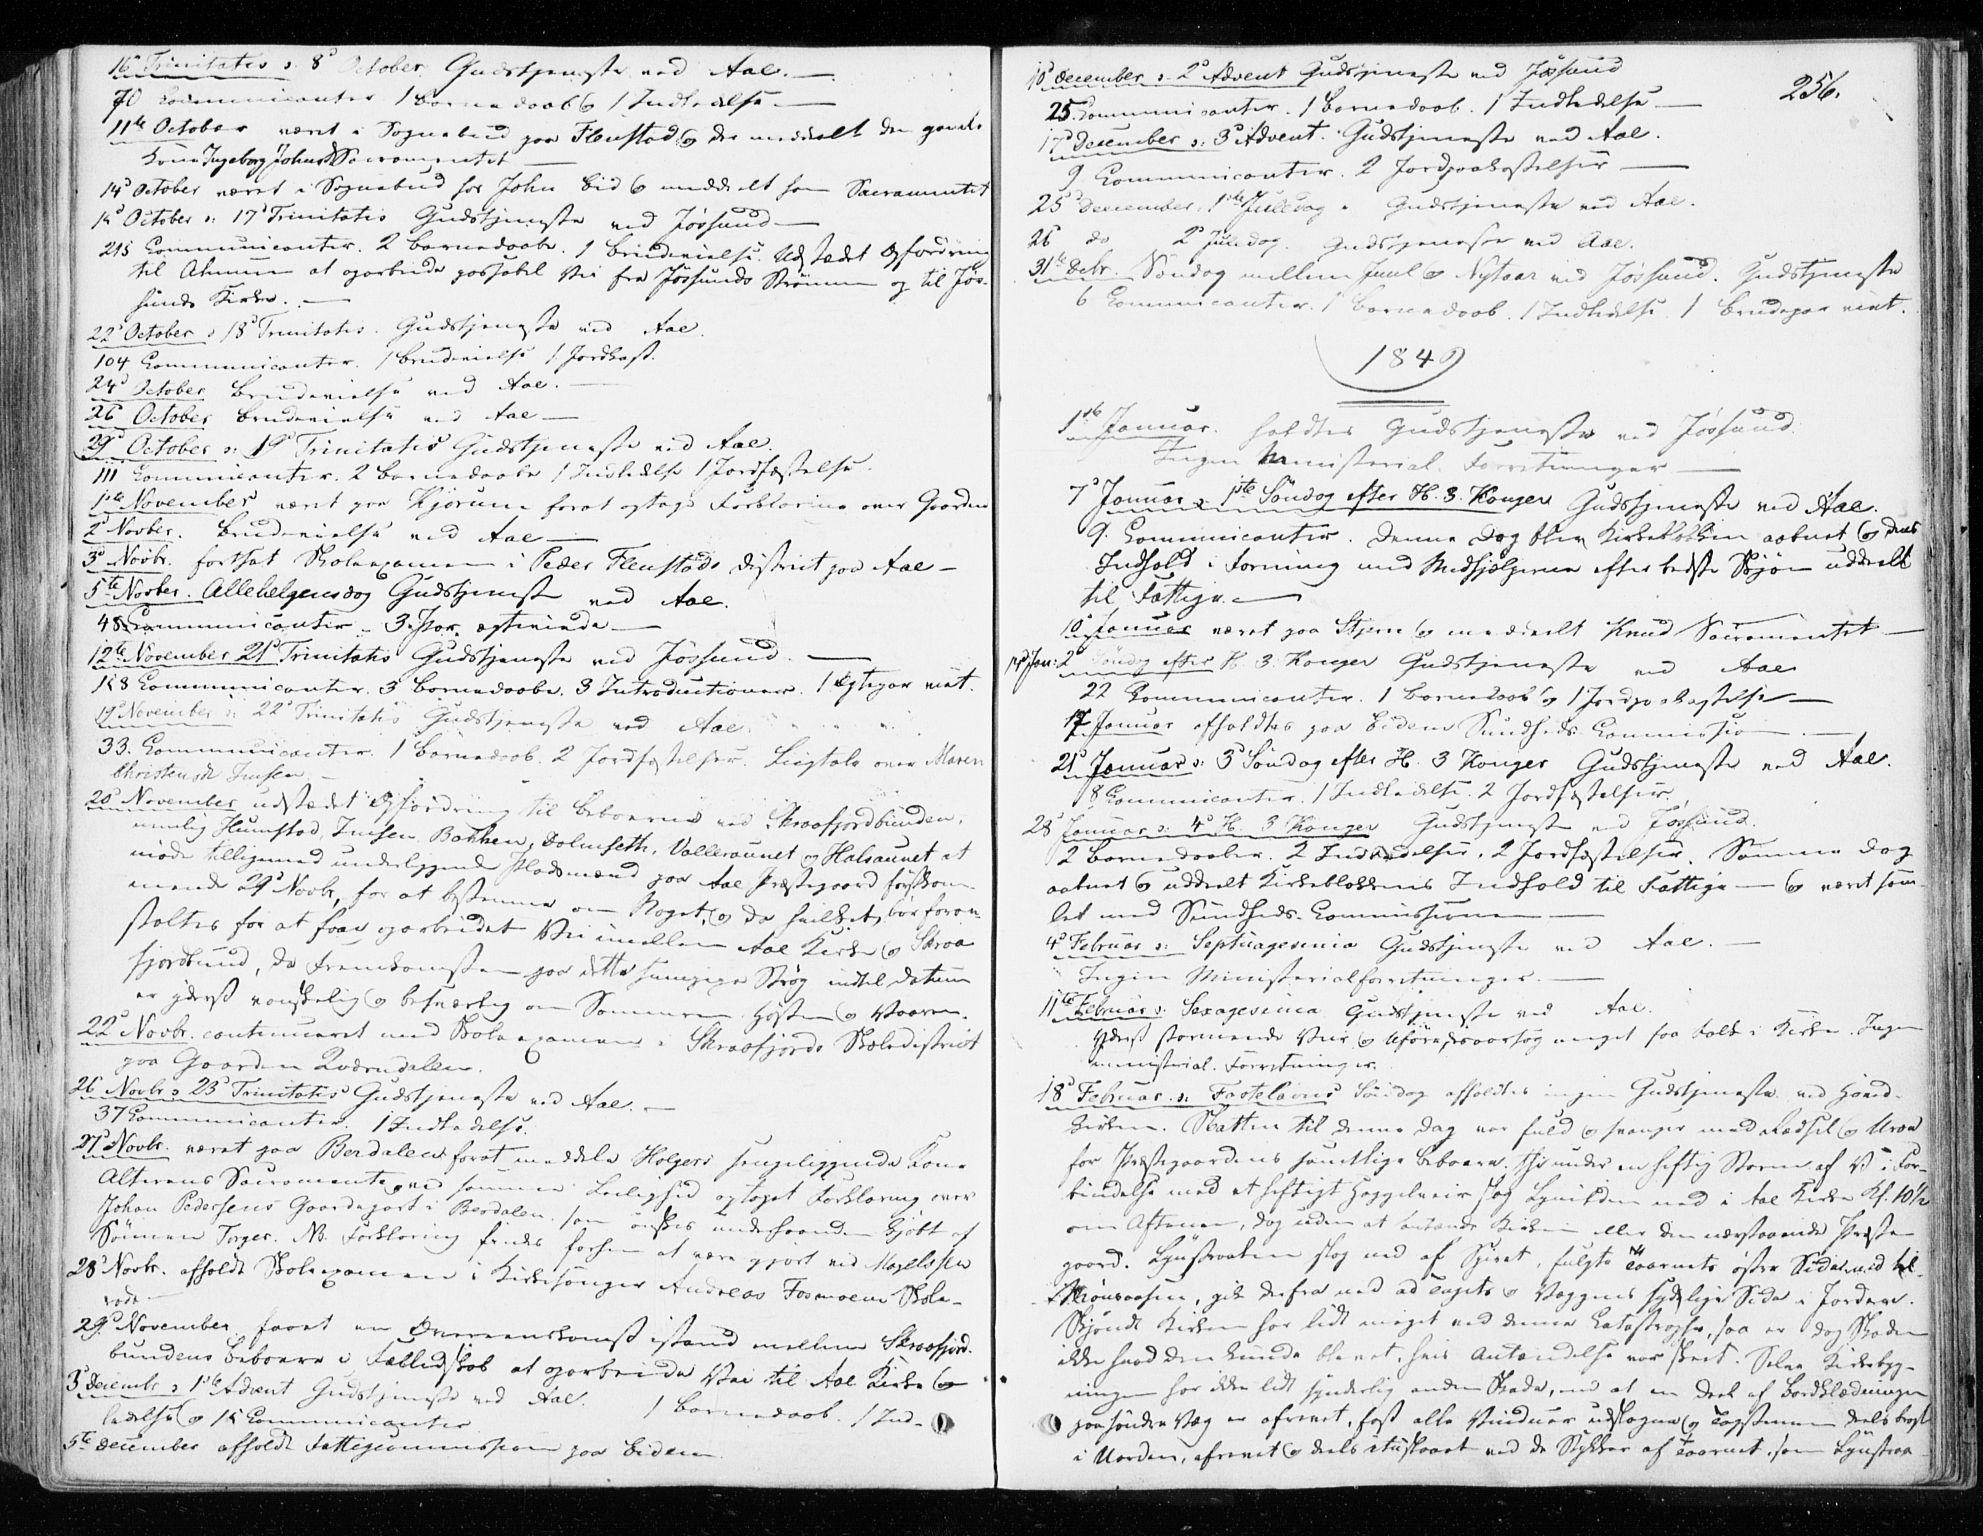 SAT, Ministerialprotokoller, klokkerbøker og fødselsregistre - Sør-Trøndelag, 655/L0677: Parish register (official) no. 655A06, 1847-1860, p. 256